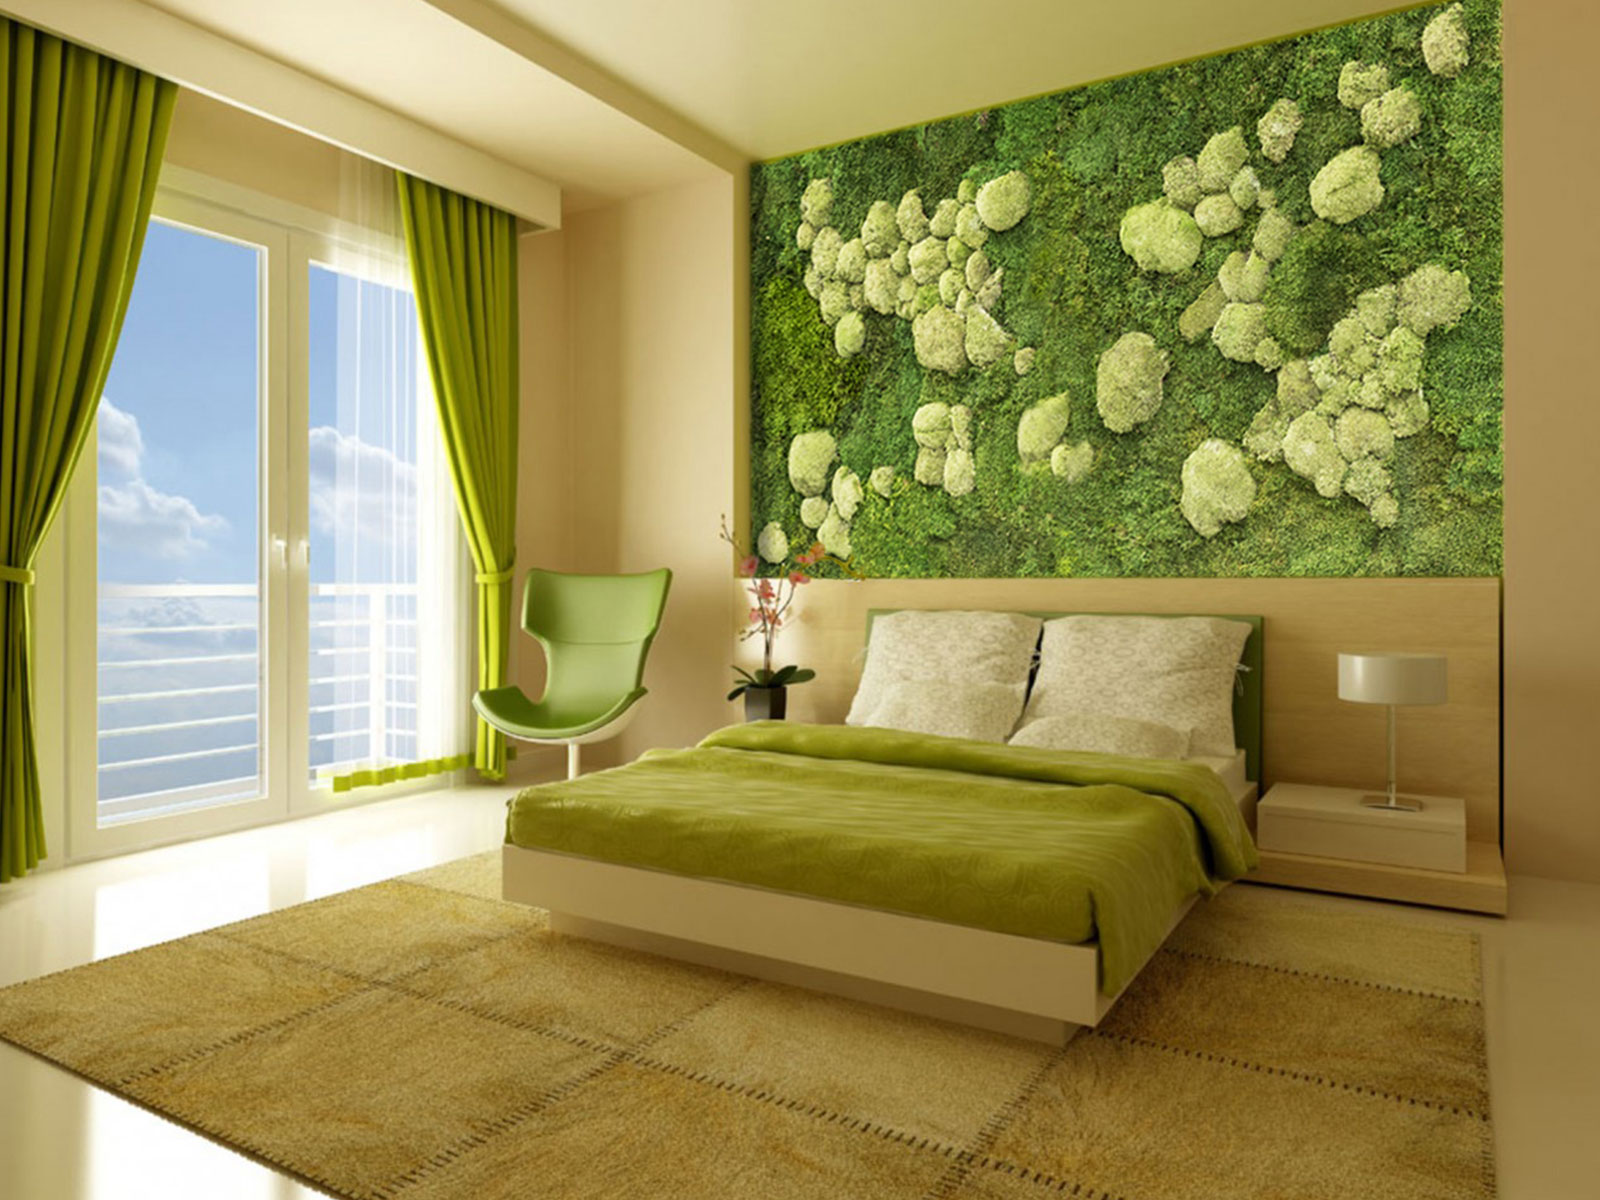 awesome moosbild selber machen photos. Black Bedroom Furniture Sets. Home Design Ideas